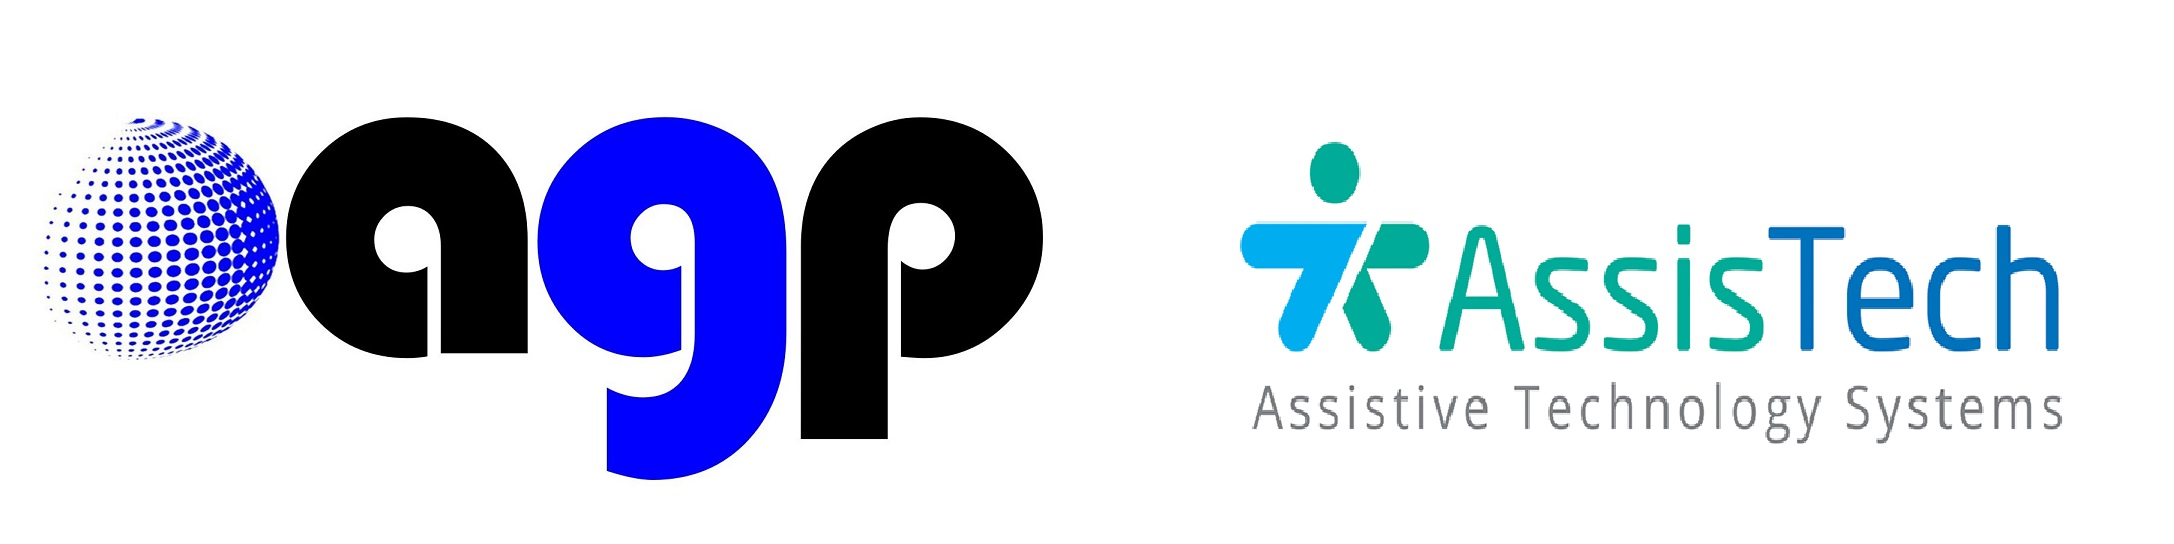 agp (advanceglobalplatforms) assistech logofundacja e-medycyna